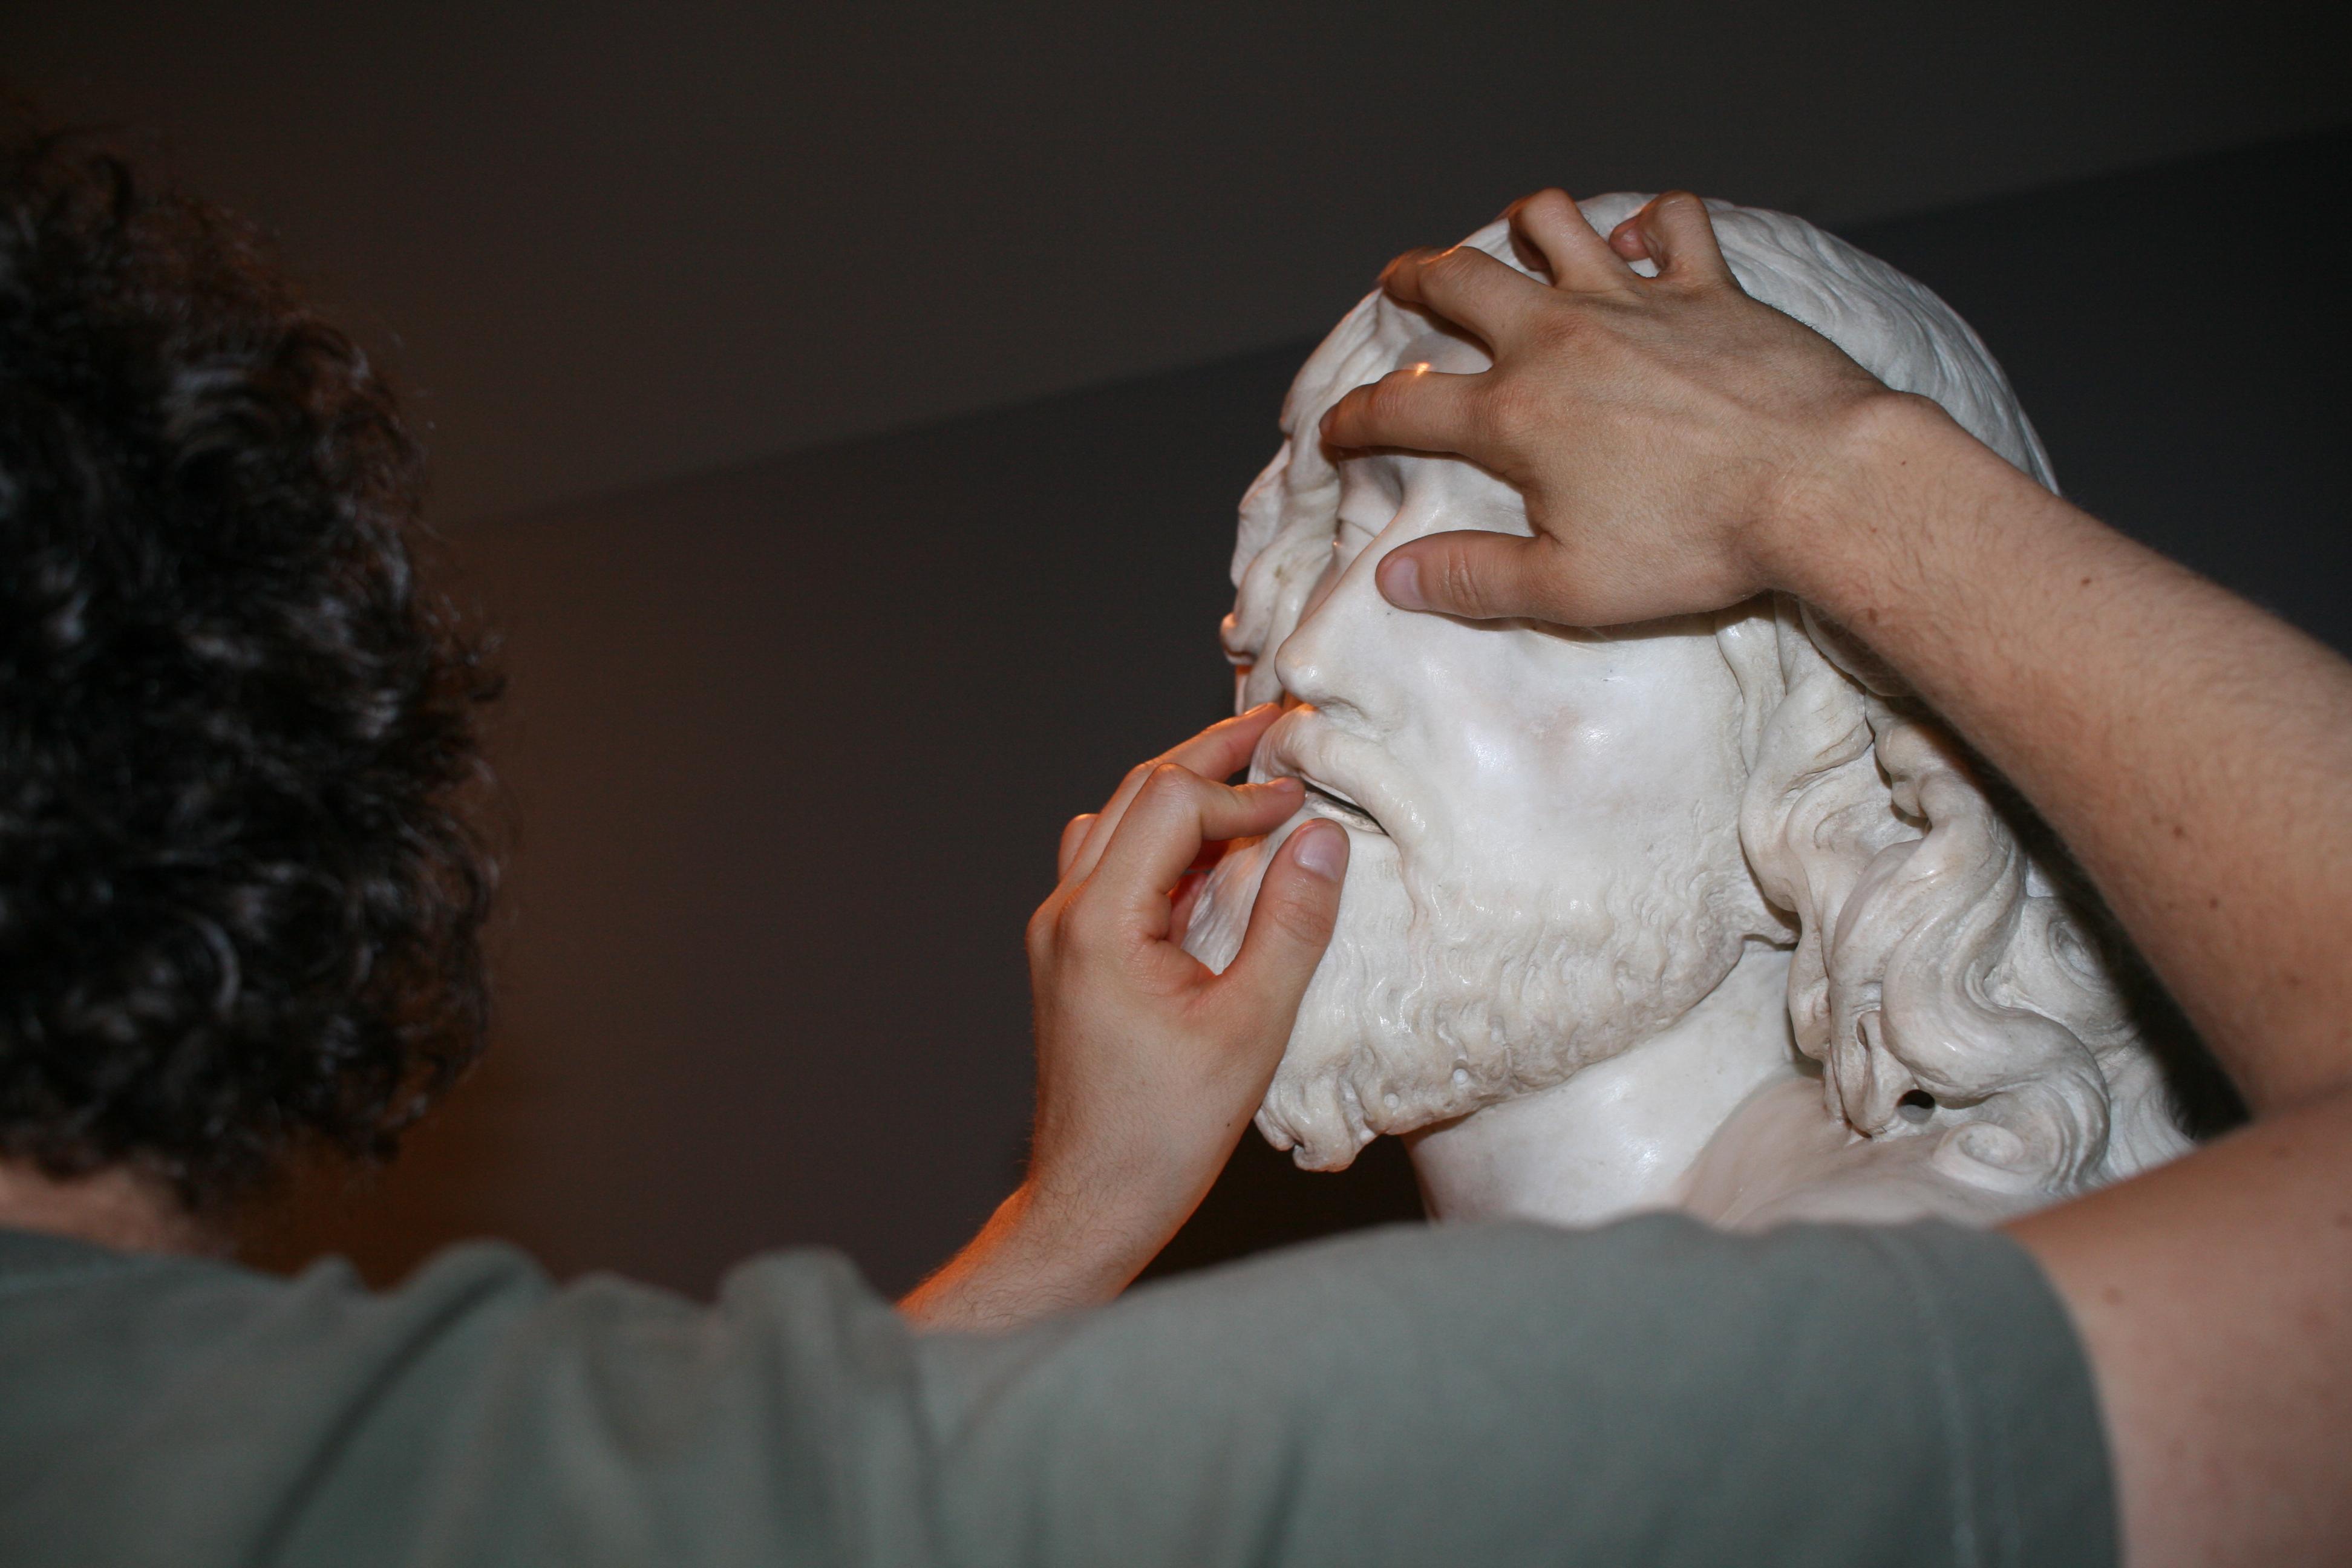 Educador ciego tocando escultura de mármol